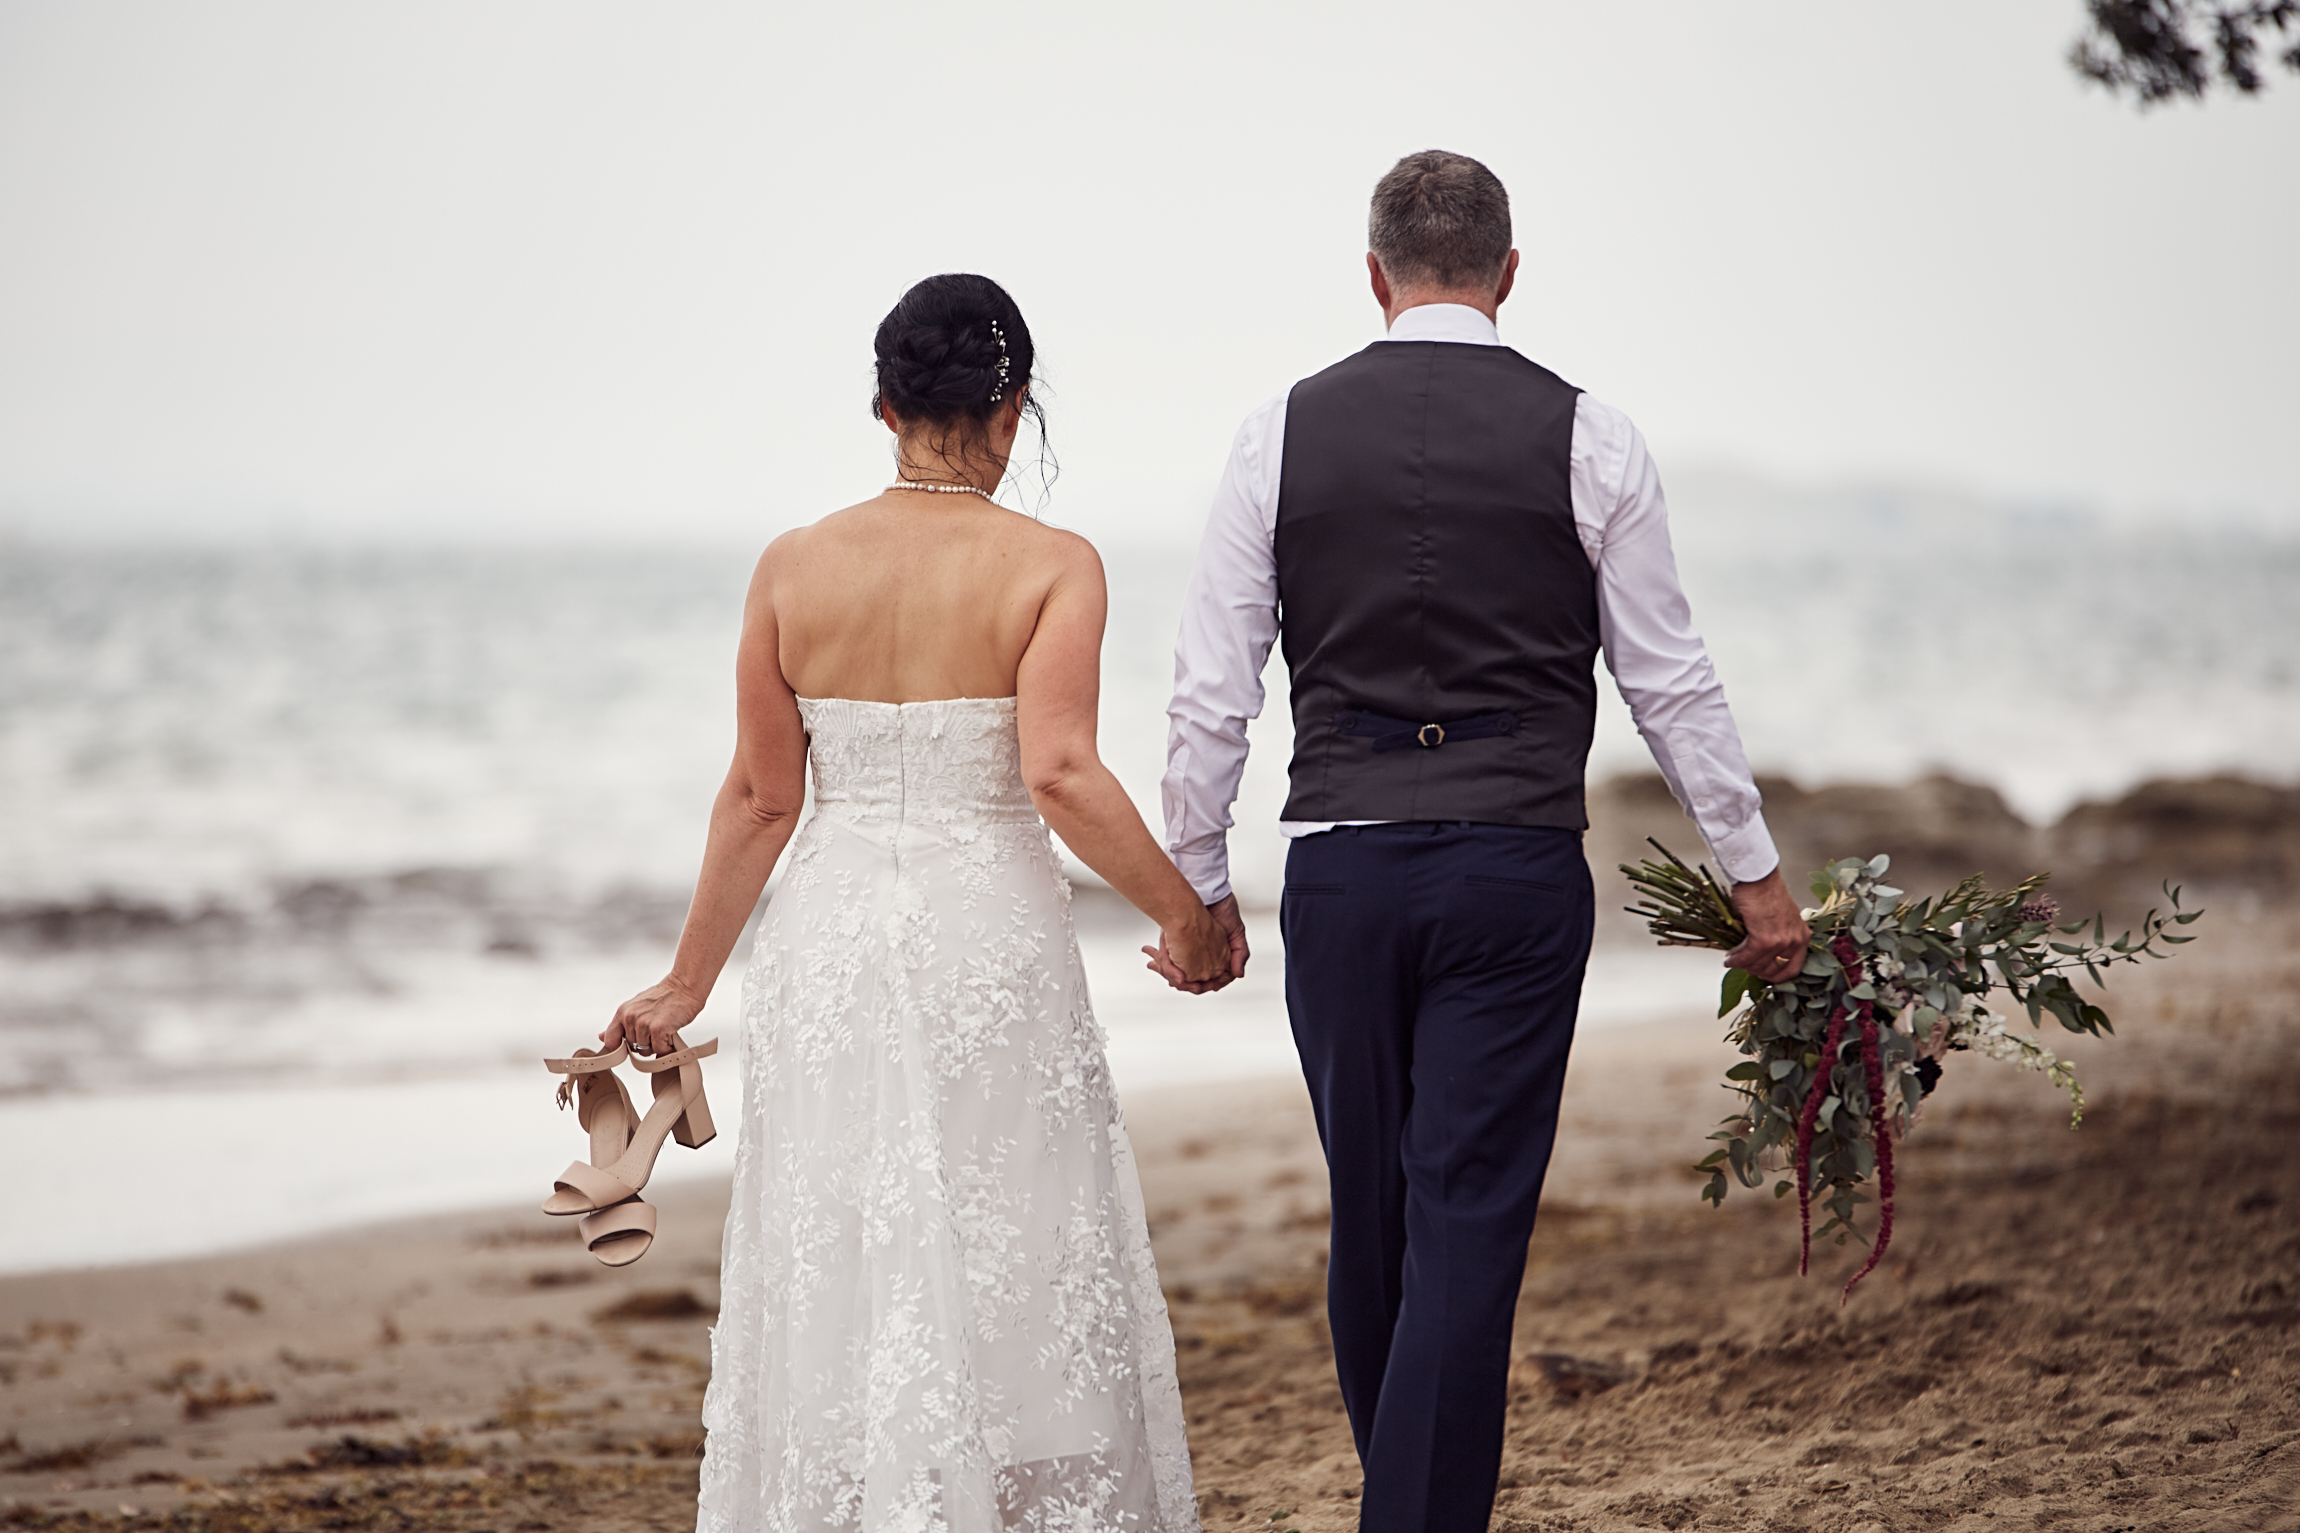 Great wedding photography